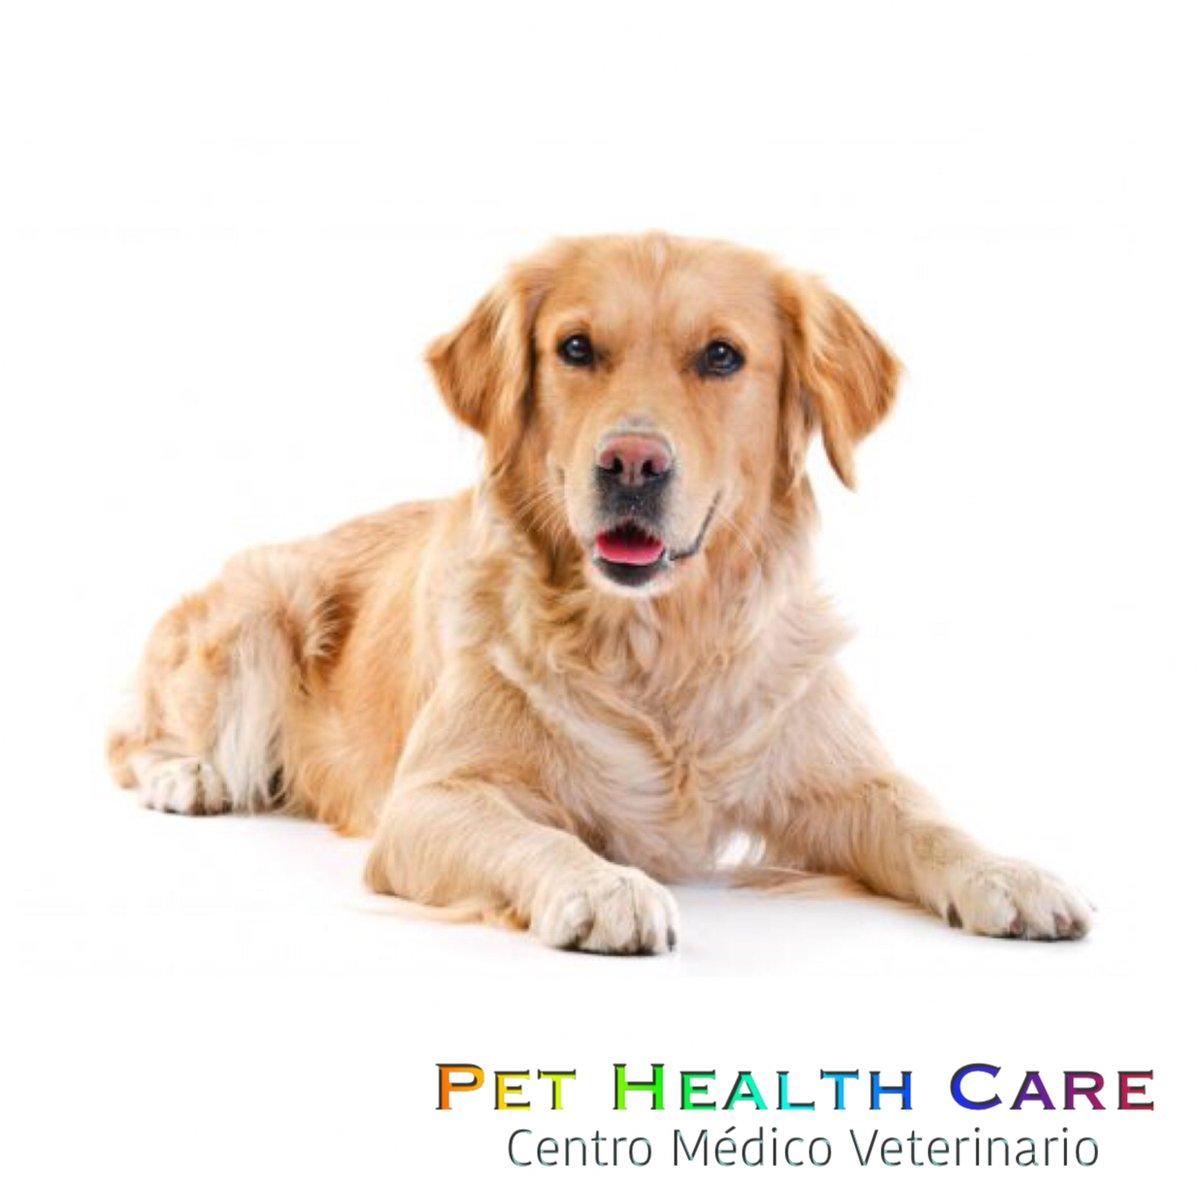 Cepilla a tu perro diariamente !!! https://t.co/EQ5cuSUpKx #perros #dogs #ilovedogs #doglovers #mascotas #pets #petlovers #colombia #tunja #veterinaria #veterinary #petshop #grooming #pethealthcare https://t.co/BOERhVpuG1